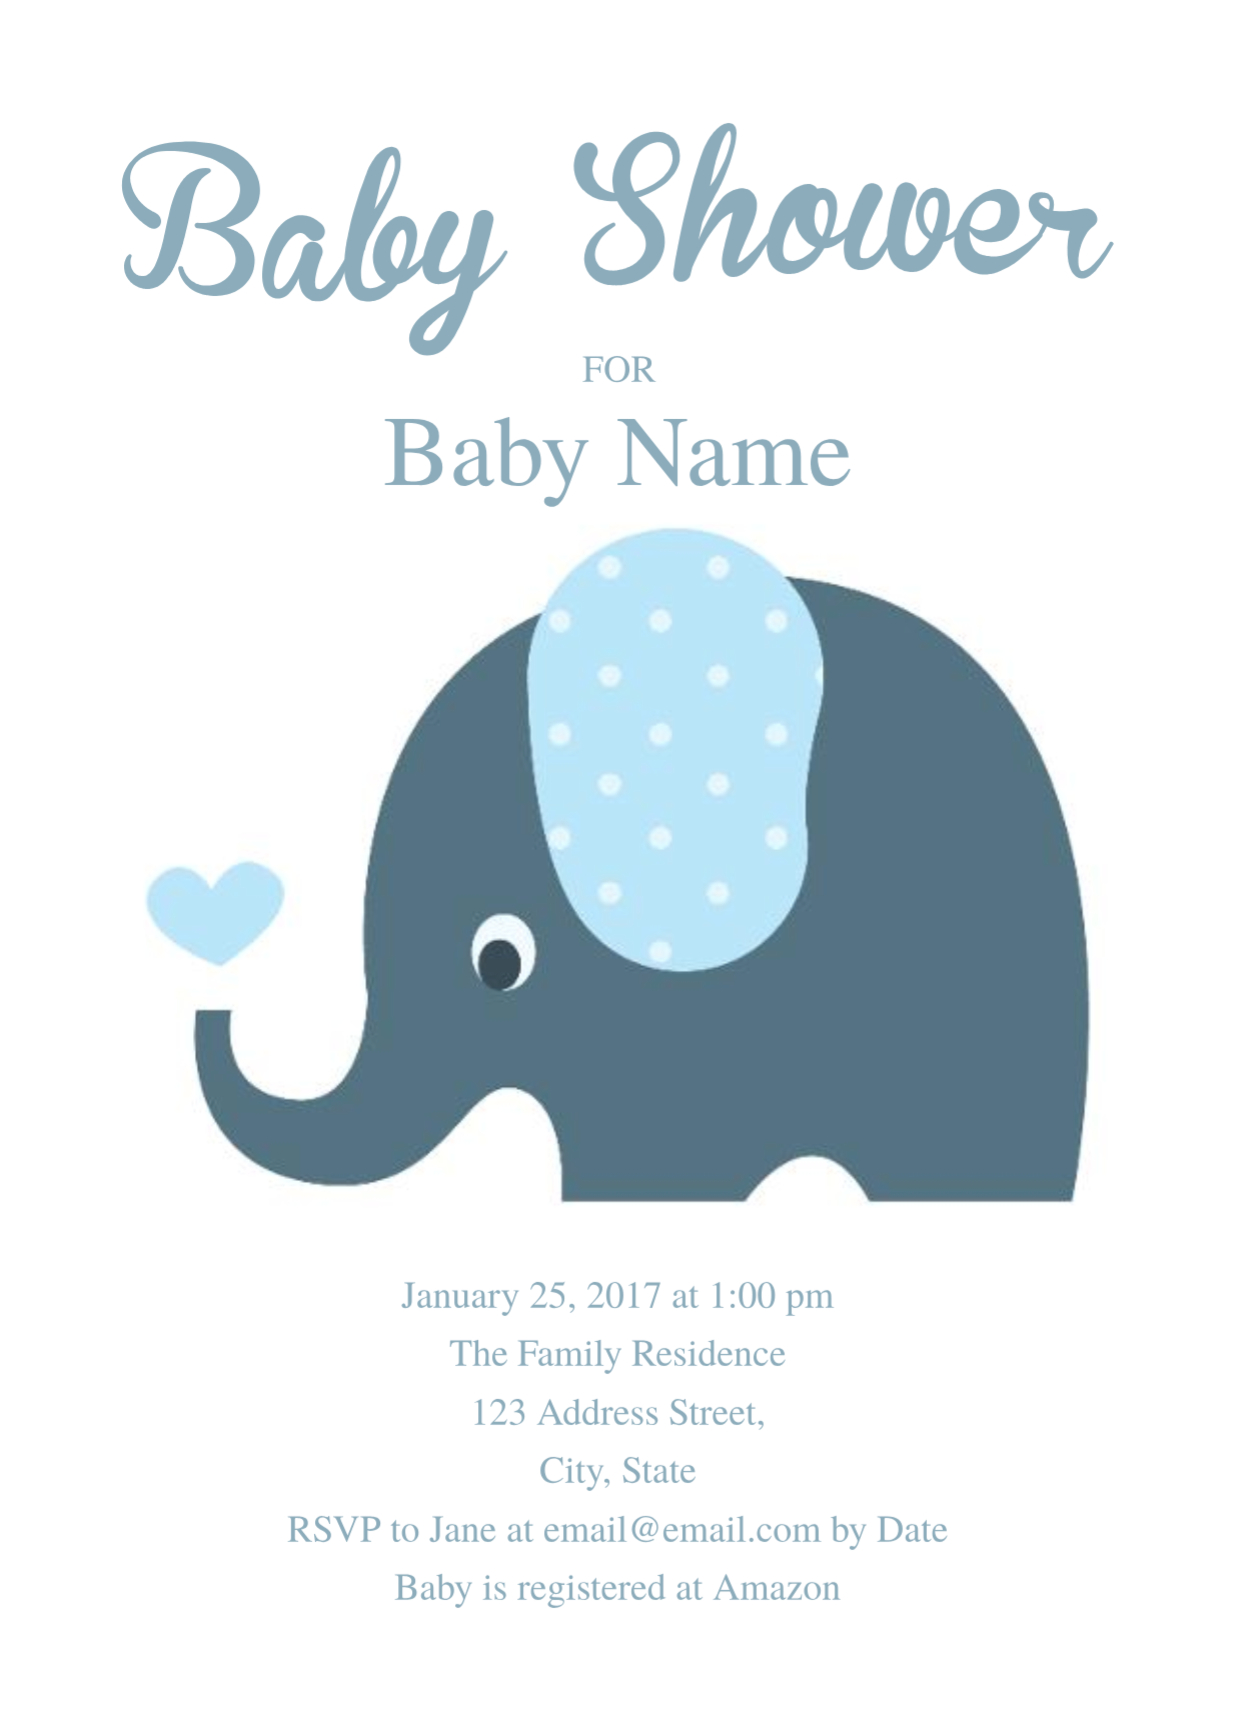 Cute Elephant Baby Shower Invitation Template   Free Invitation - Free Printable Elephant Baby Shower Invitations